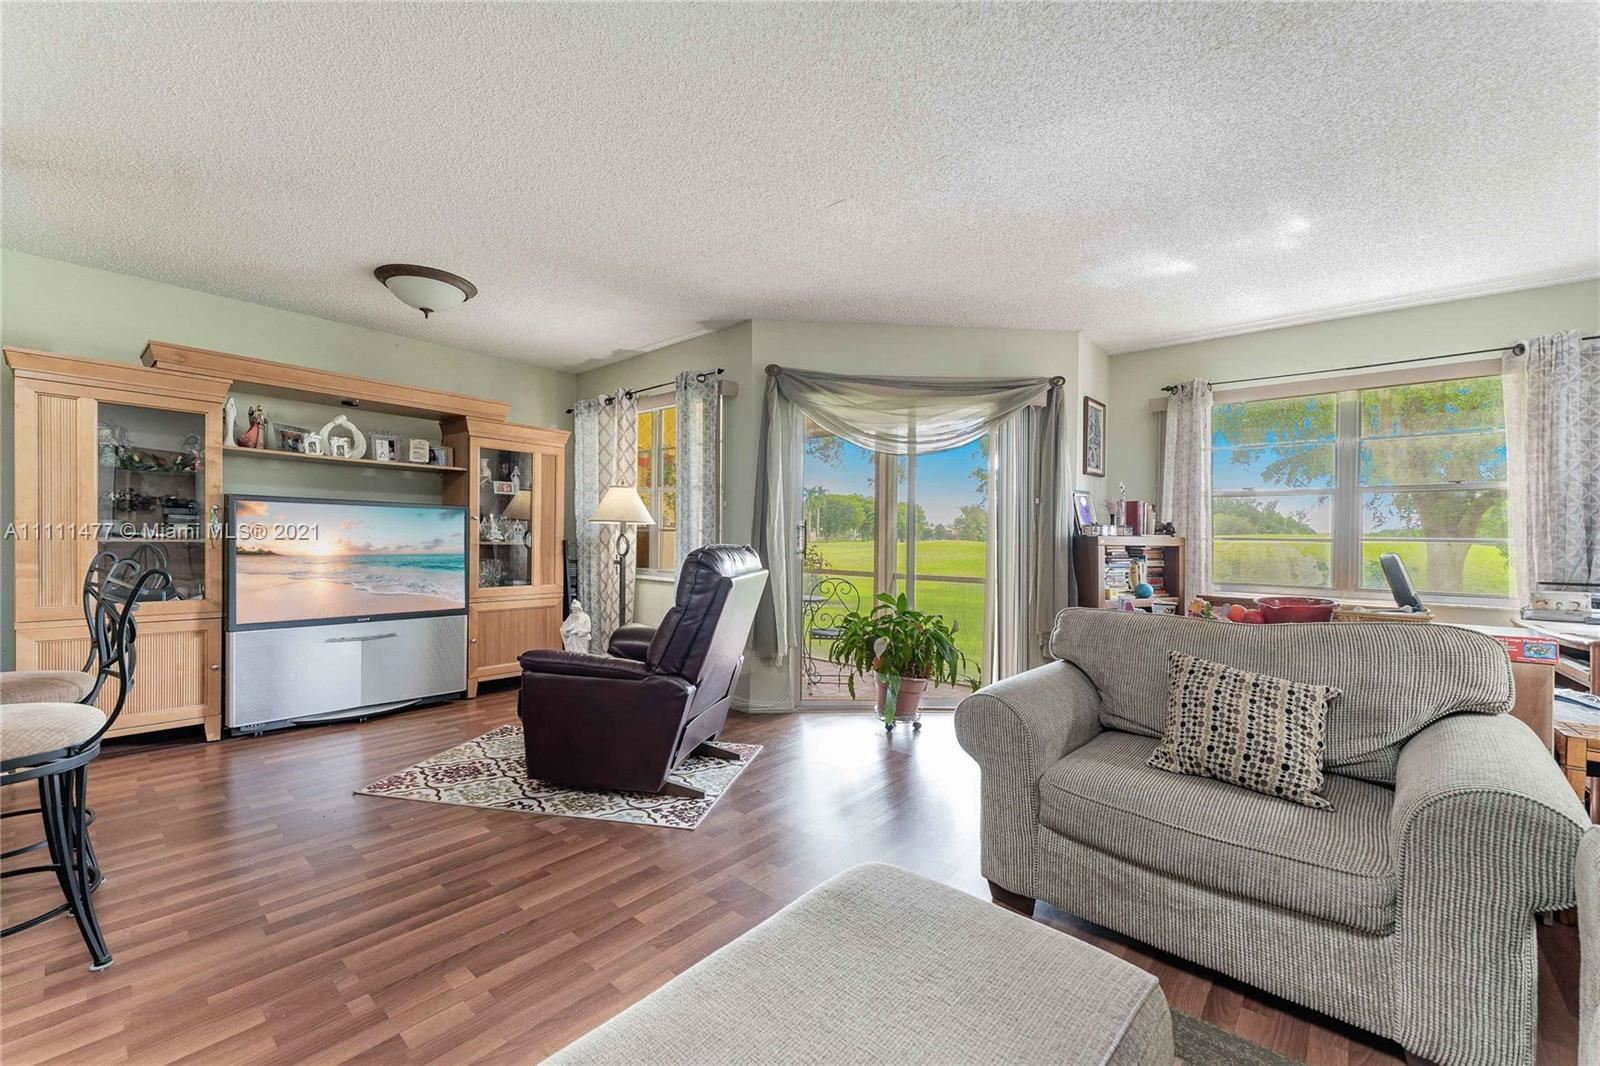 Photo of 12800 SW 7th Ct #112G, Pembroke Pines, FL 33027 (MLS # A11111477)